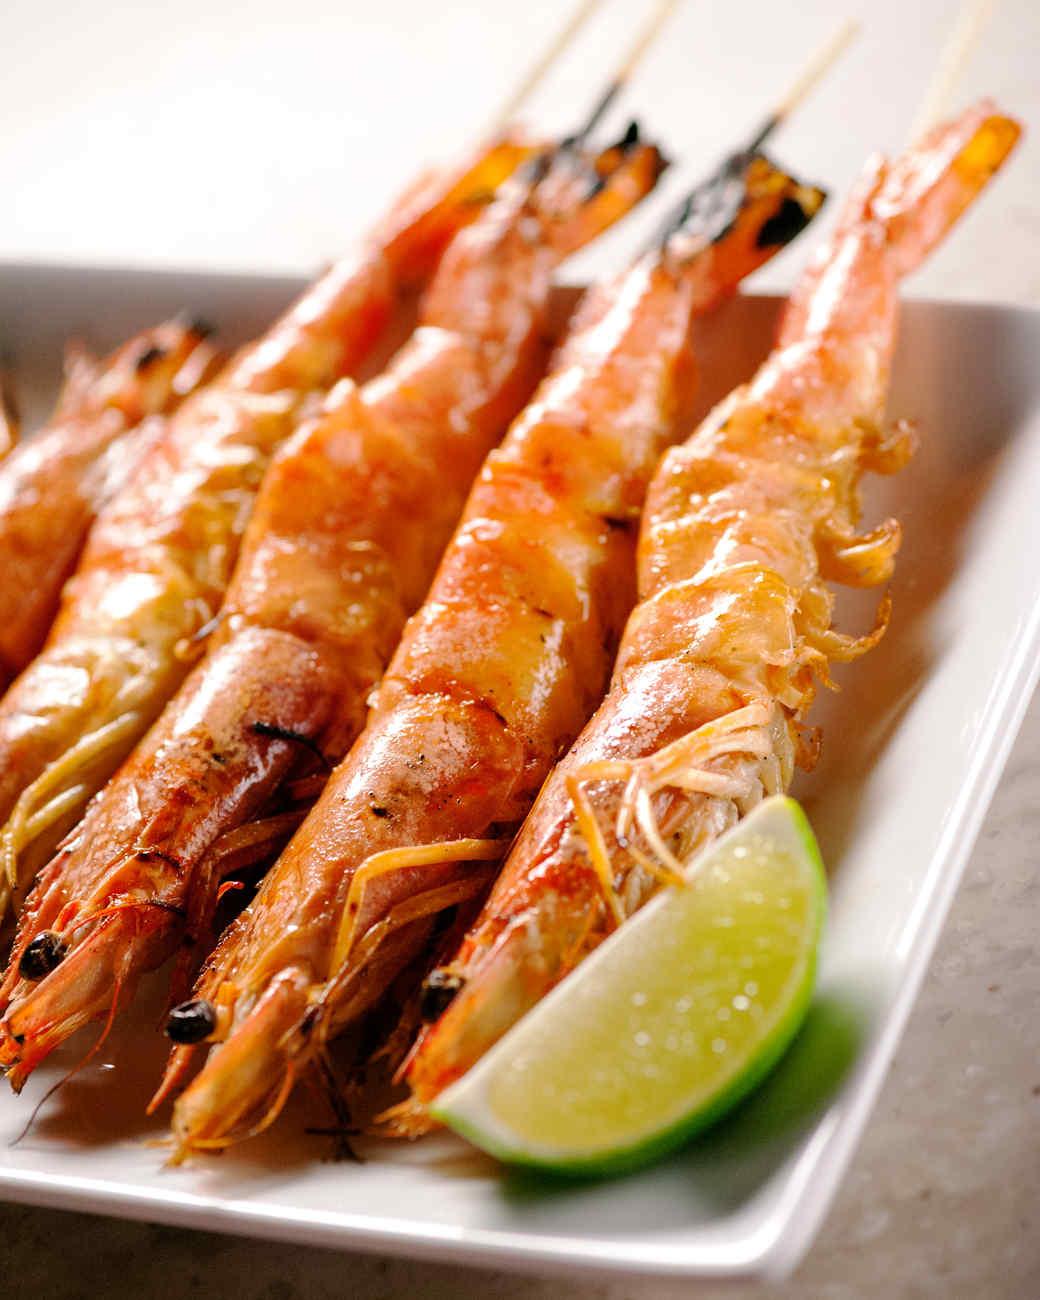 martha-cooking-school-shrimp-grilled-shrimp-cs2005.jpg